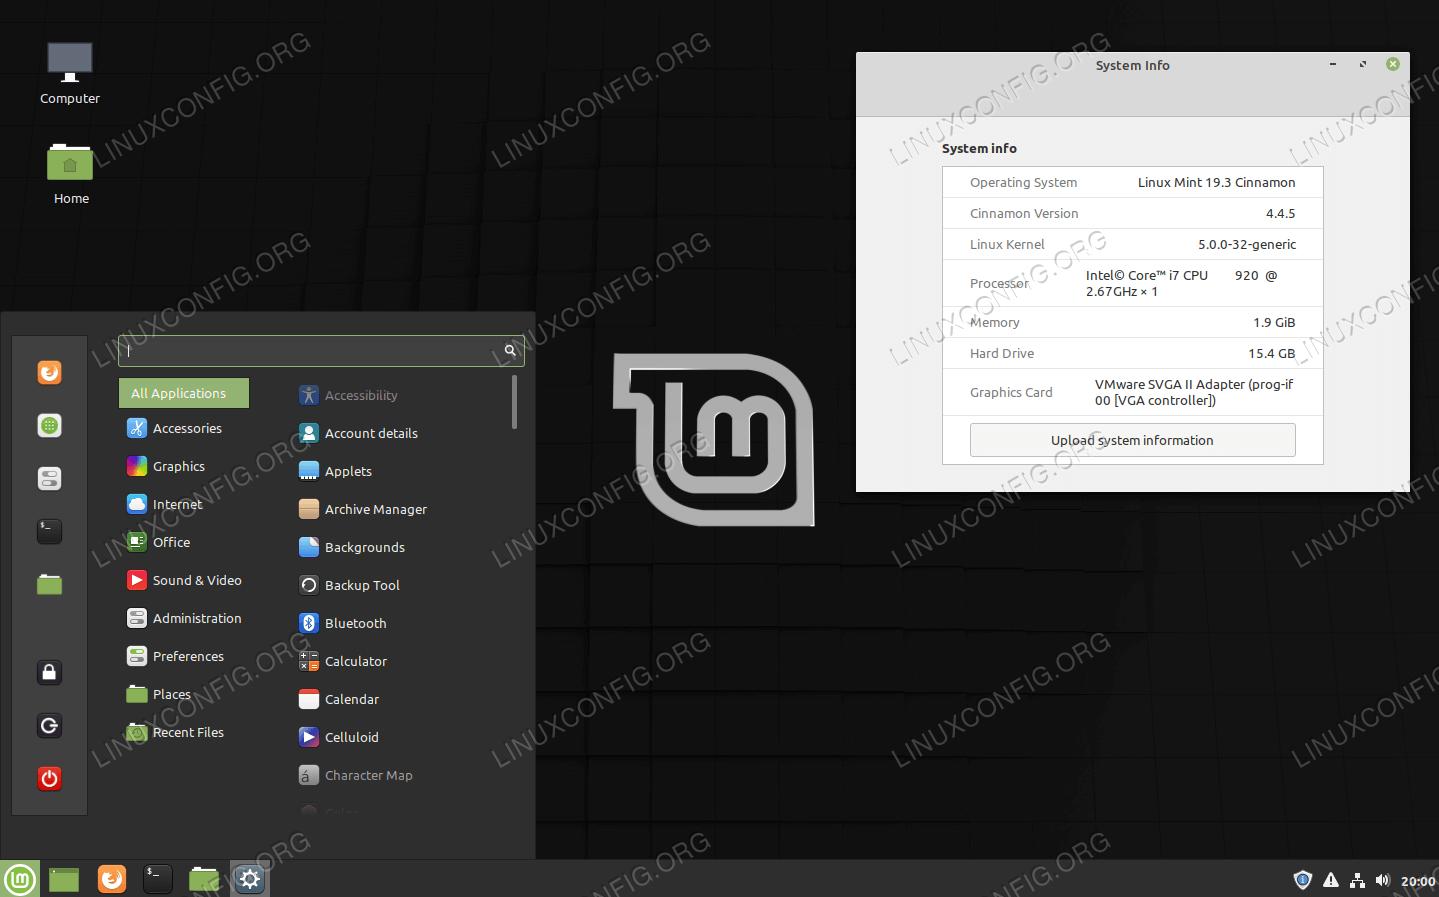 Linux Mint running Cinnamon desktop environment